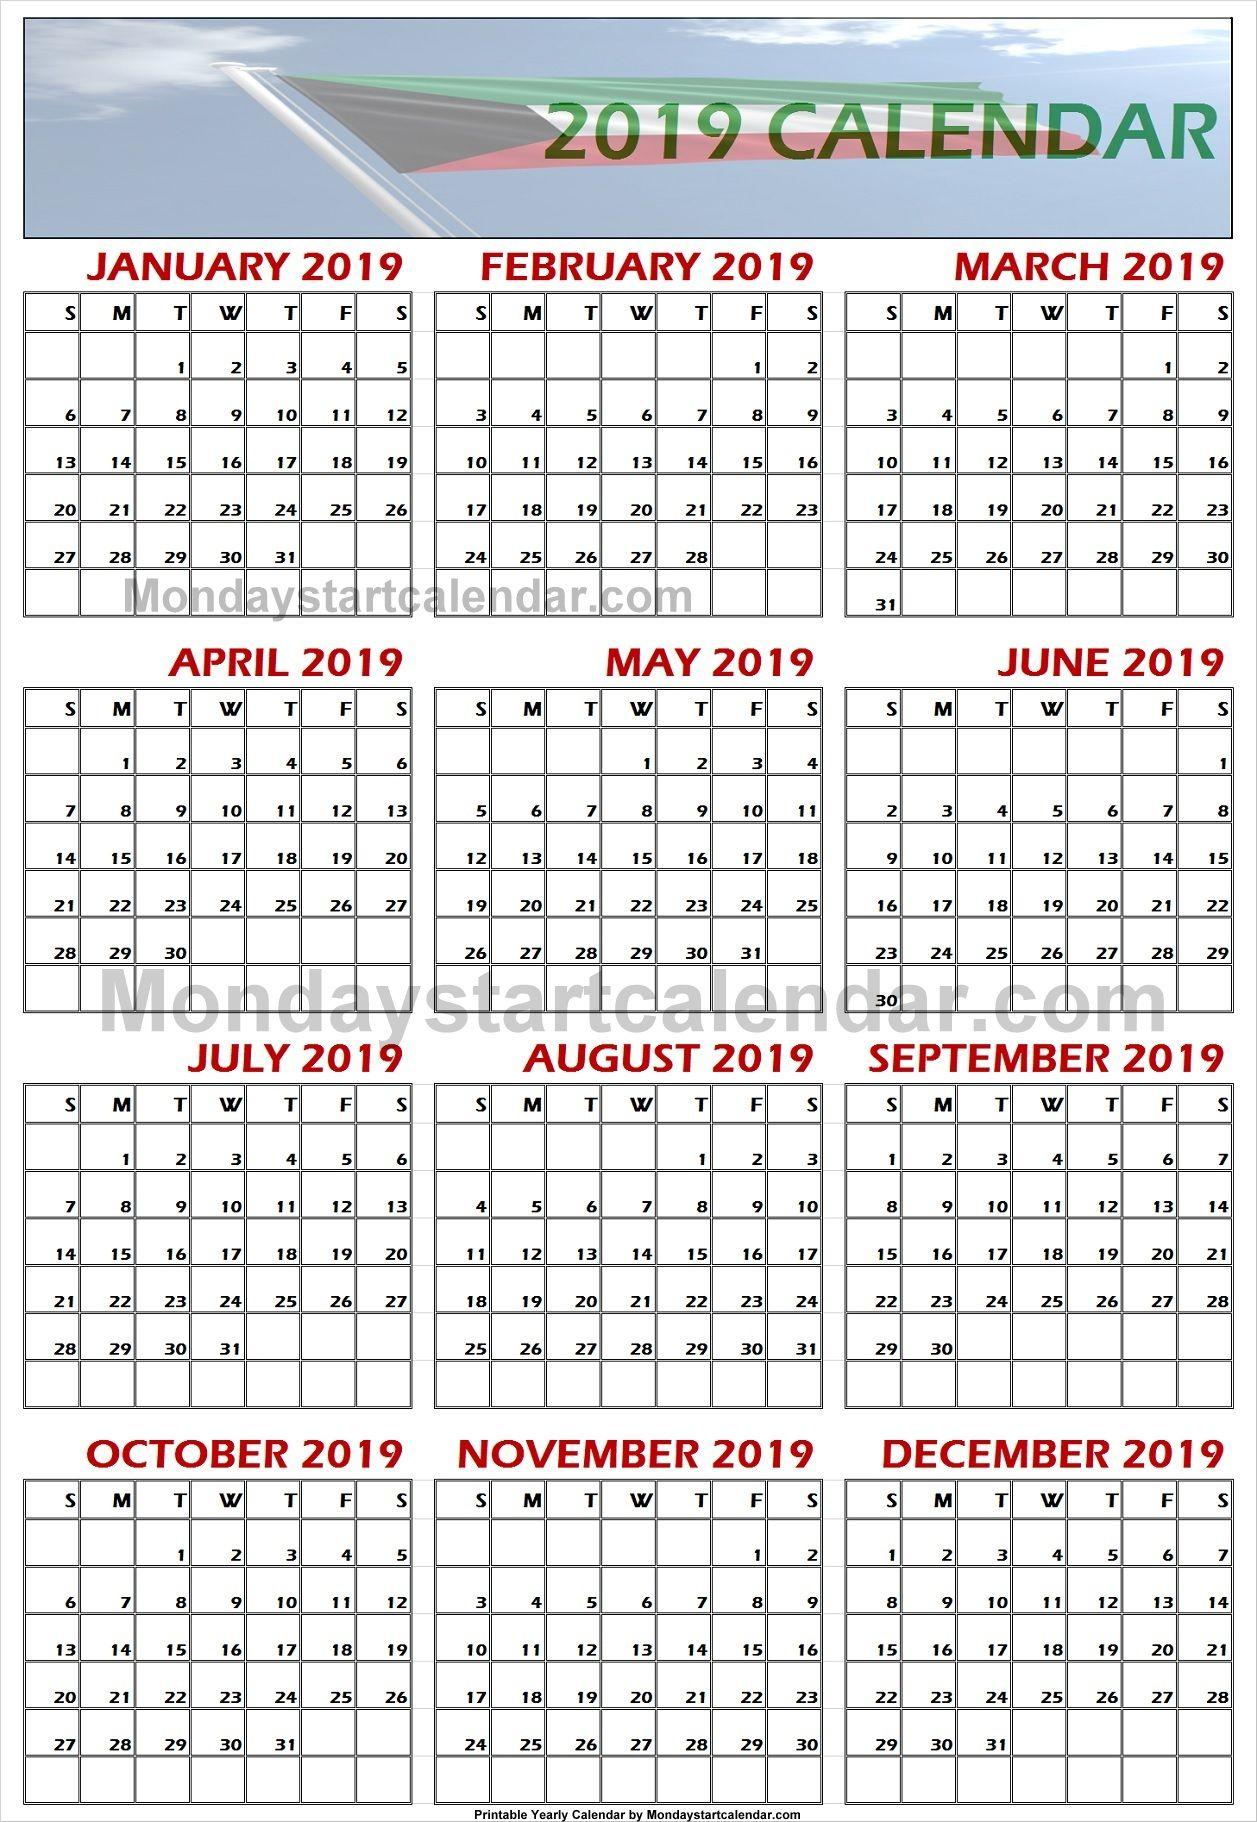 2019 Kuwait Calendar   School Holiday Calendar, Holiday